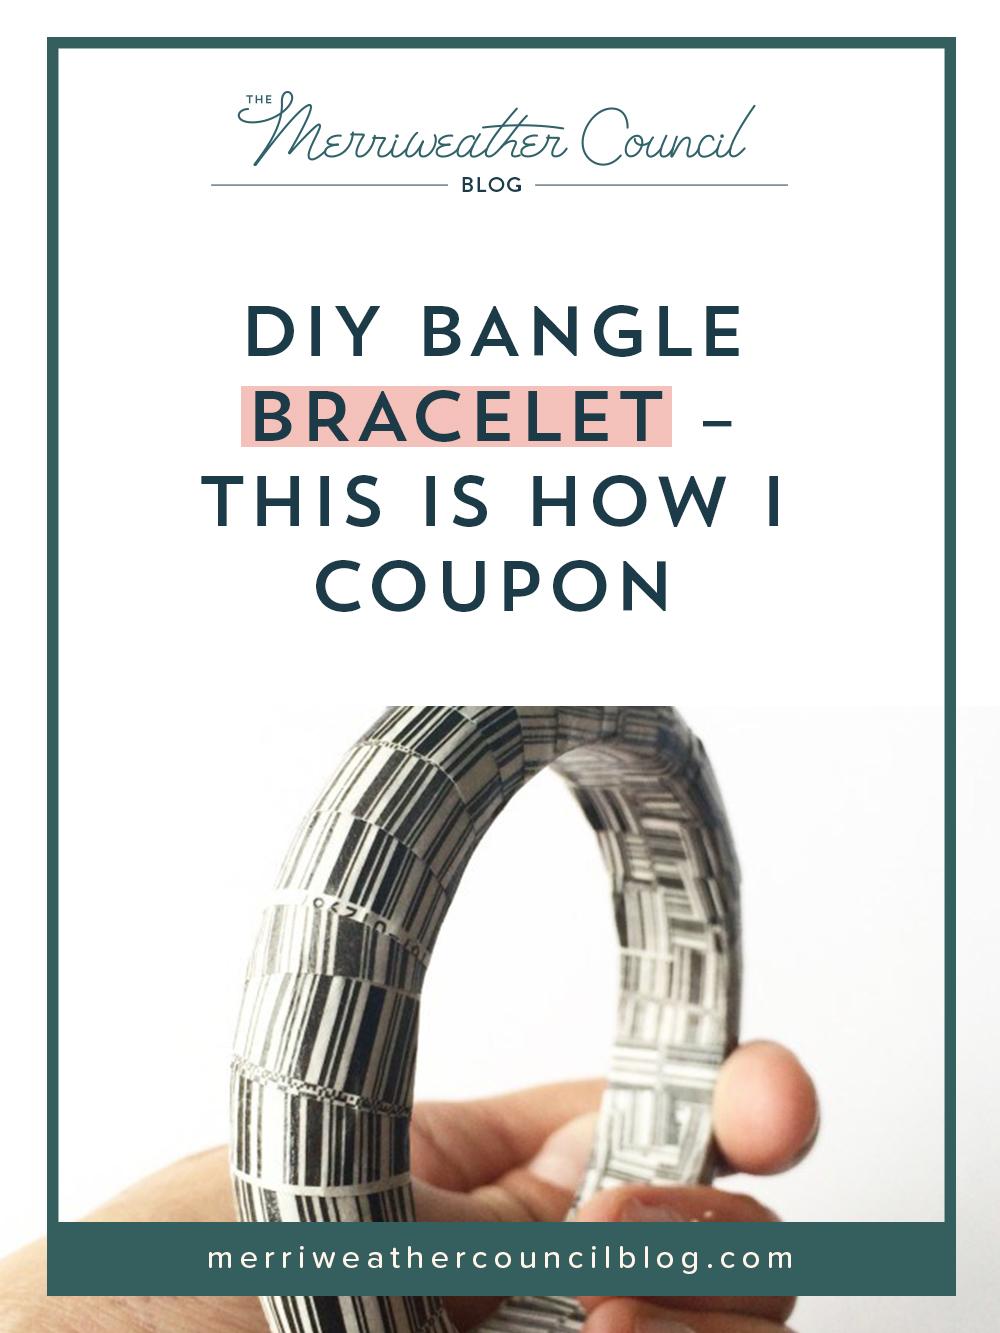 DIY decoupaged bangle bracelet | the merriweather council blog